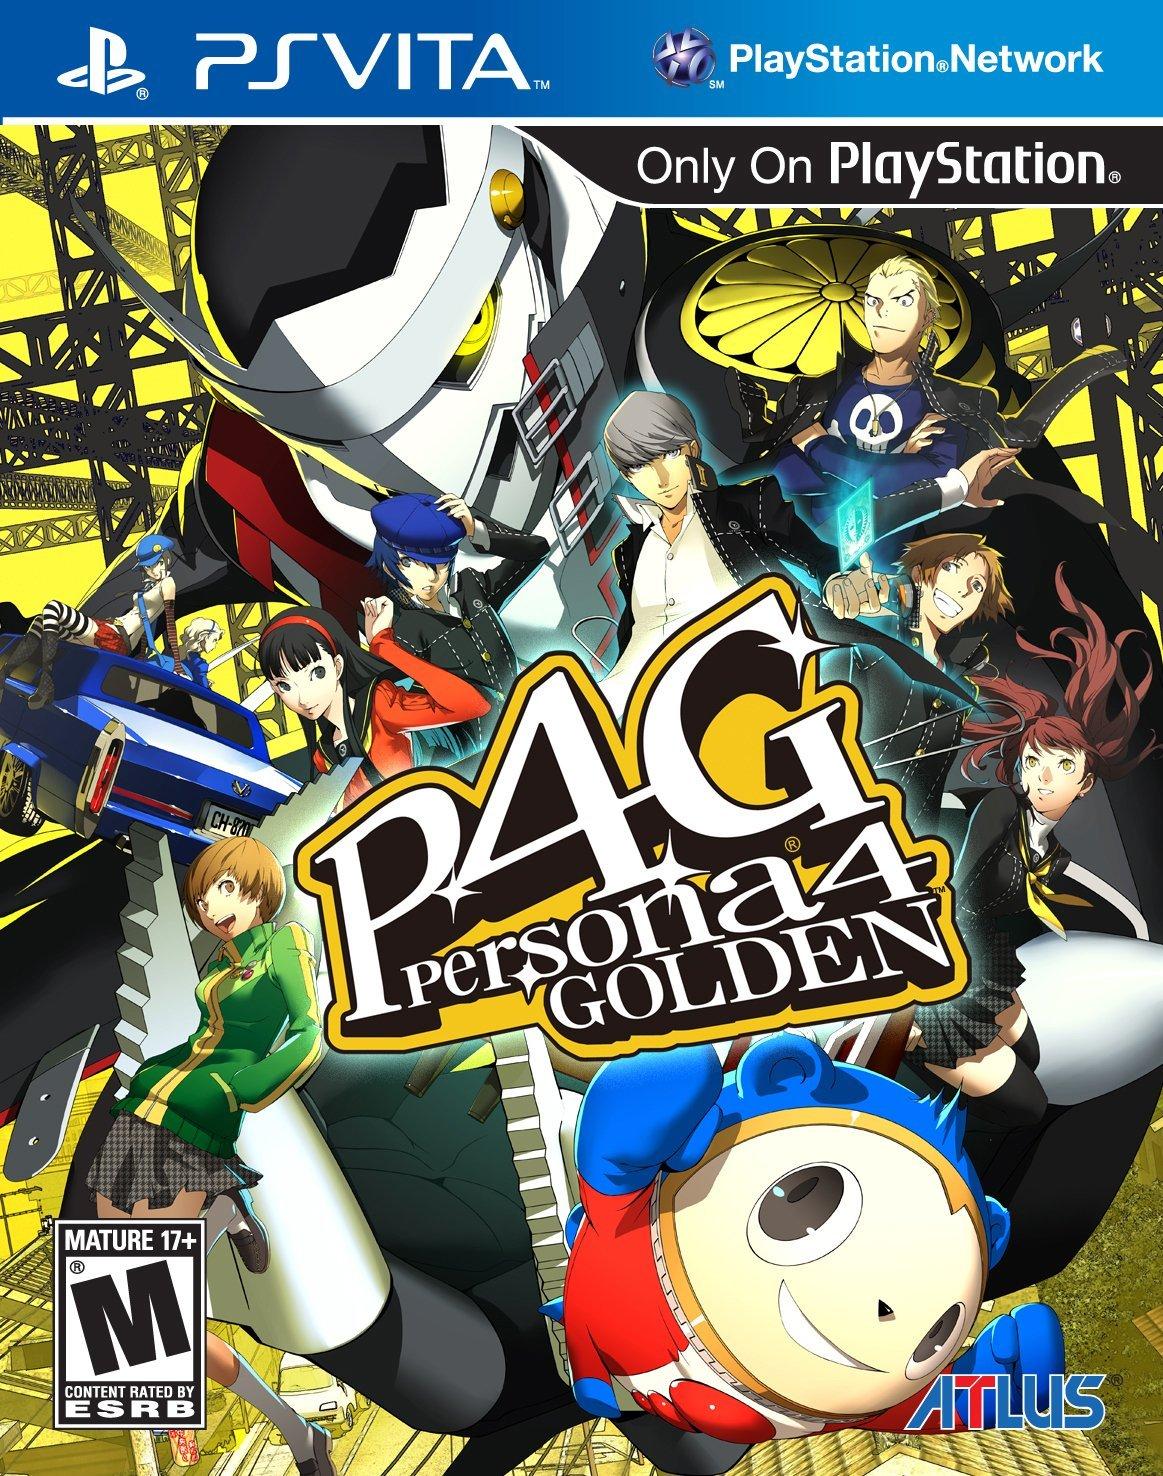 Persona 4 Golden - PS Vita [Digital Code] $9.90 + Free Shipping from Amazon